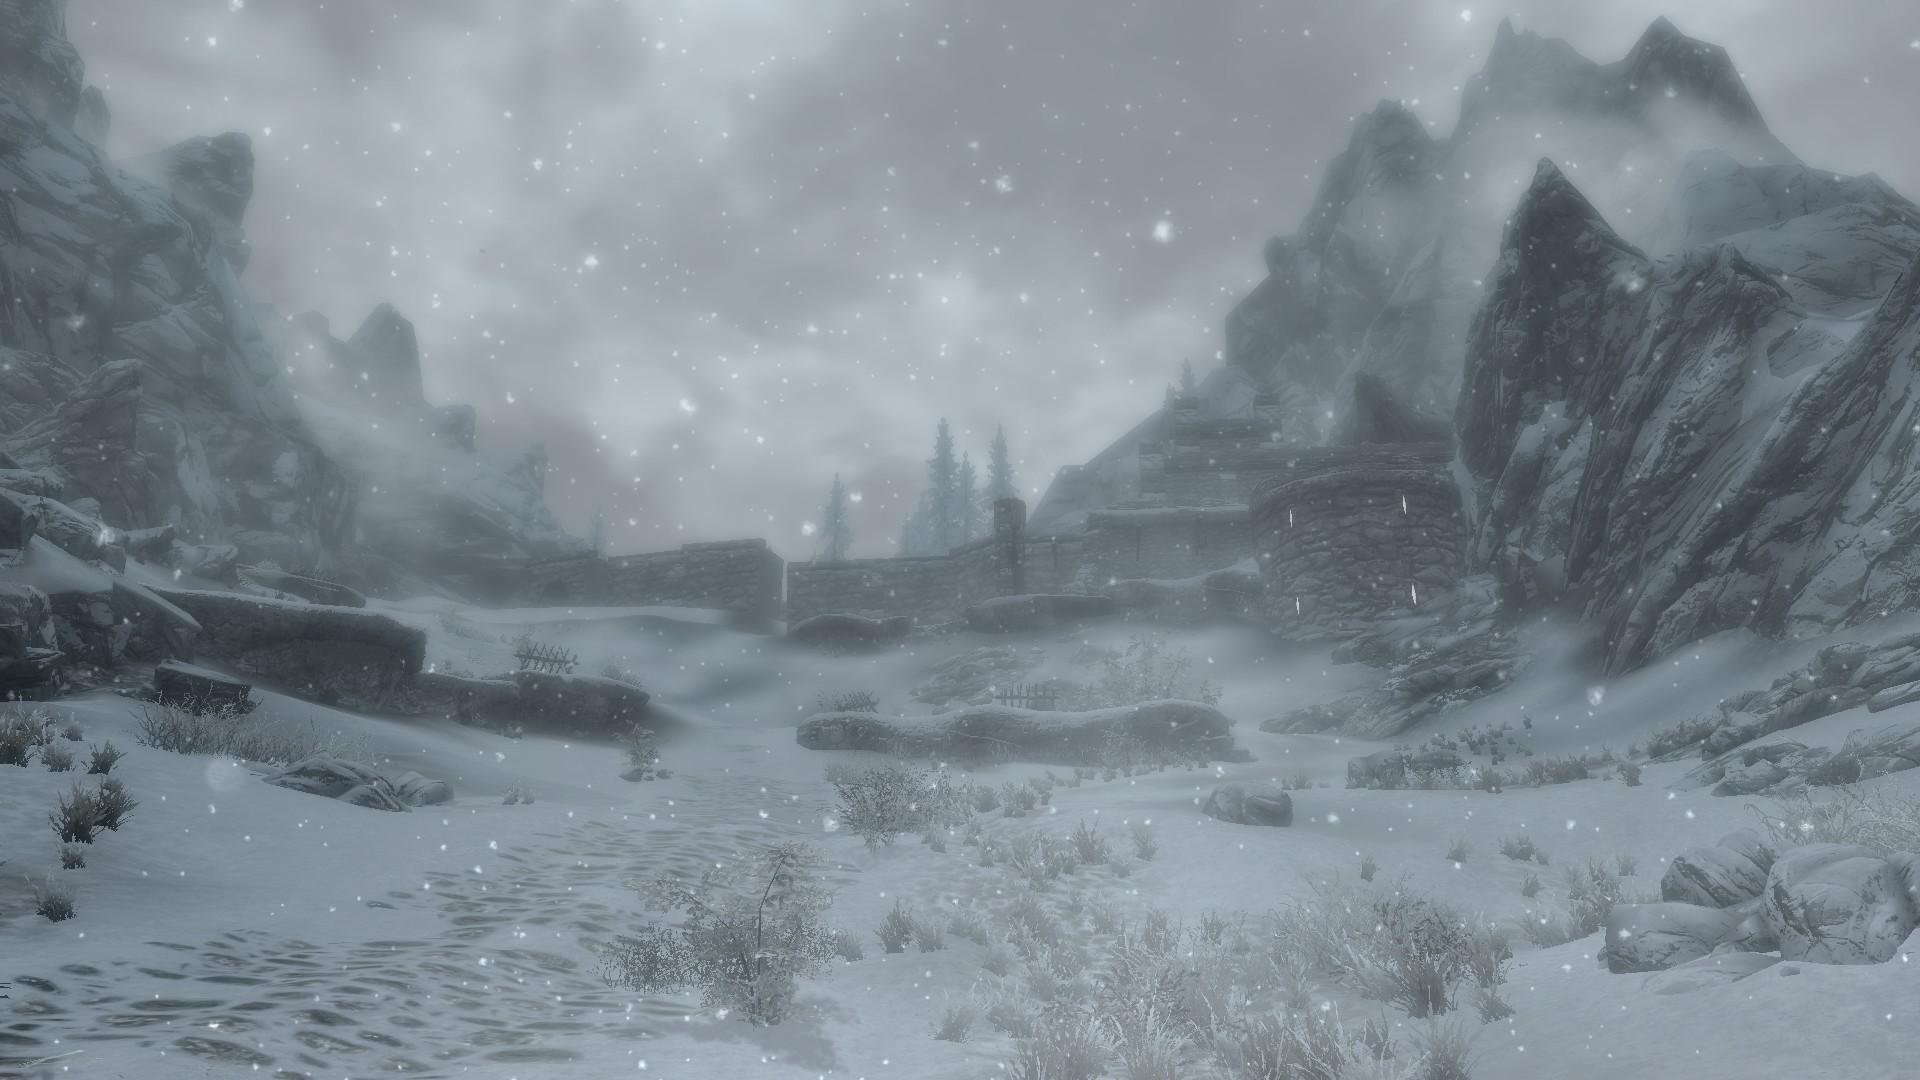 1920x1080 px fort landscape mountain snow The Elder Scrolls V Skyrim winter